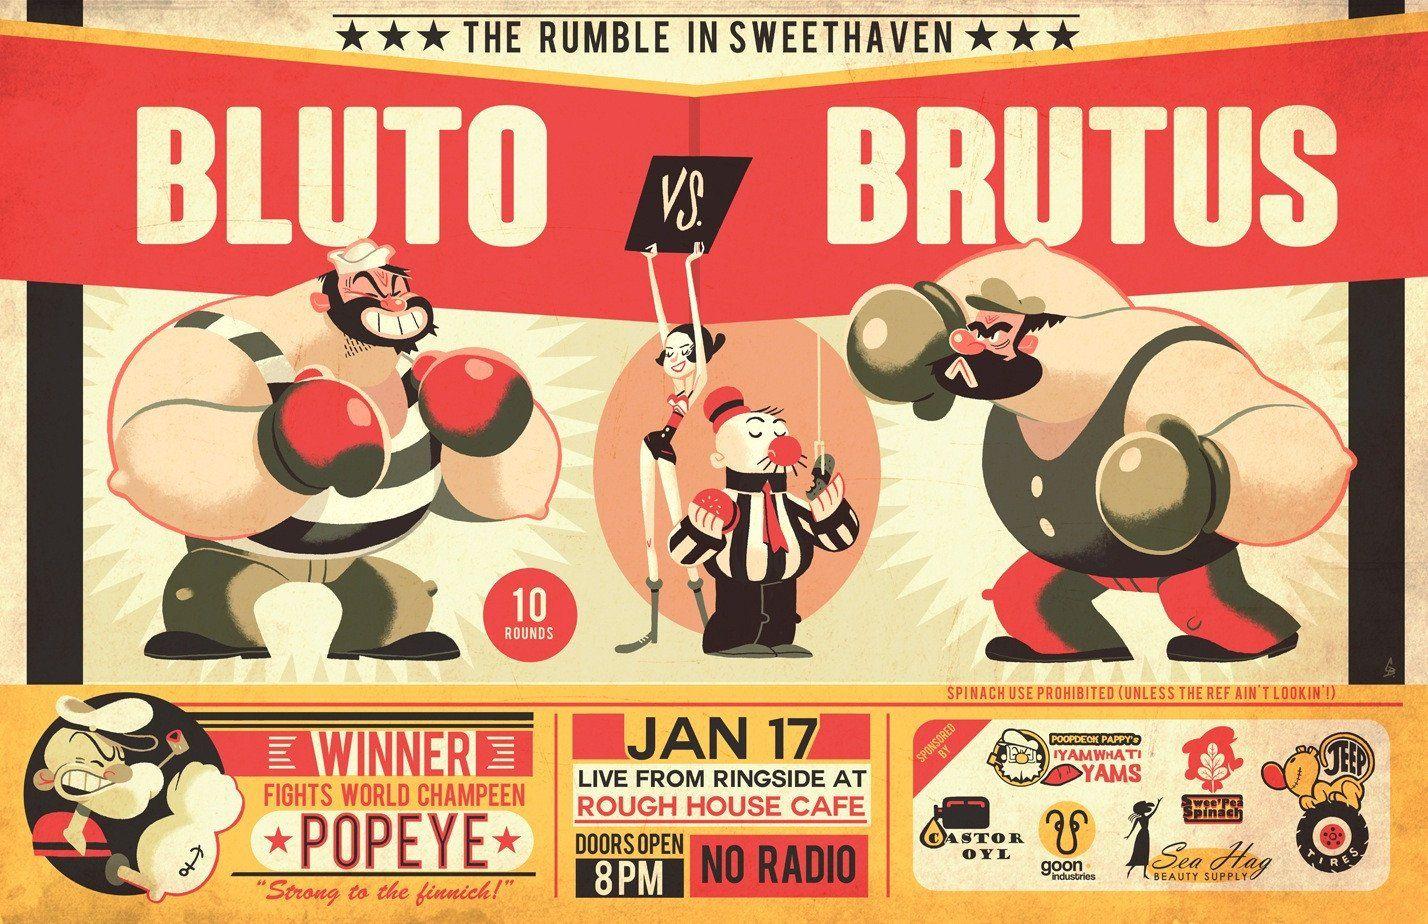 Bluto vs. Brutus